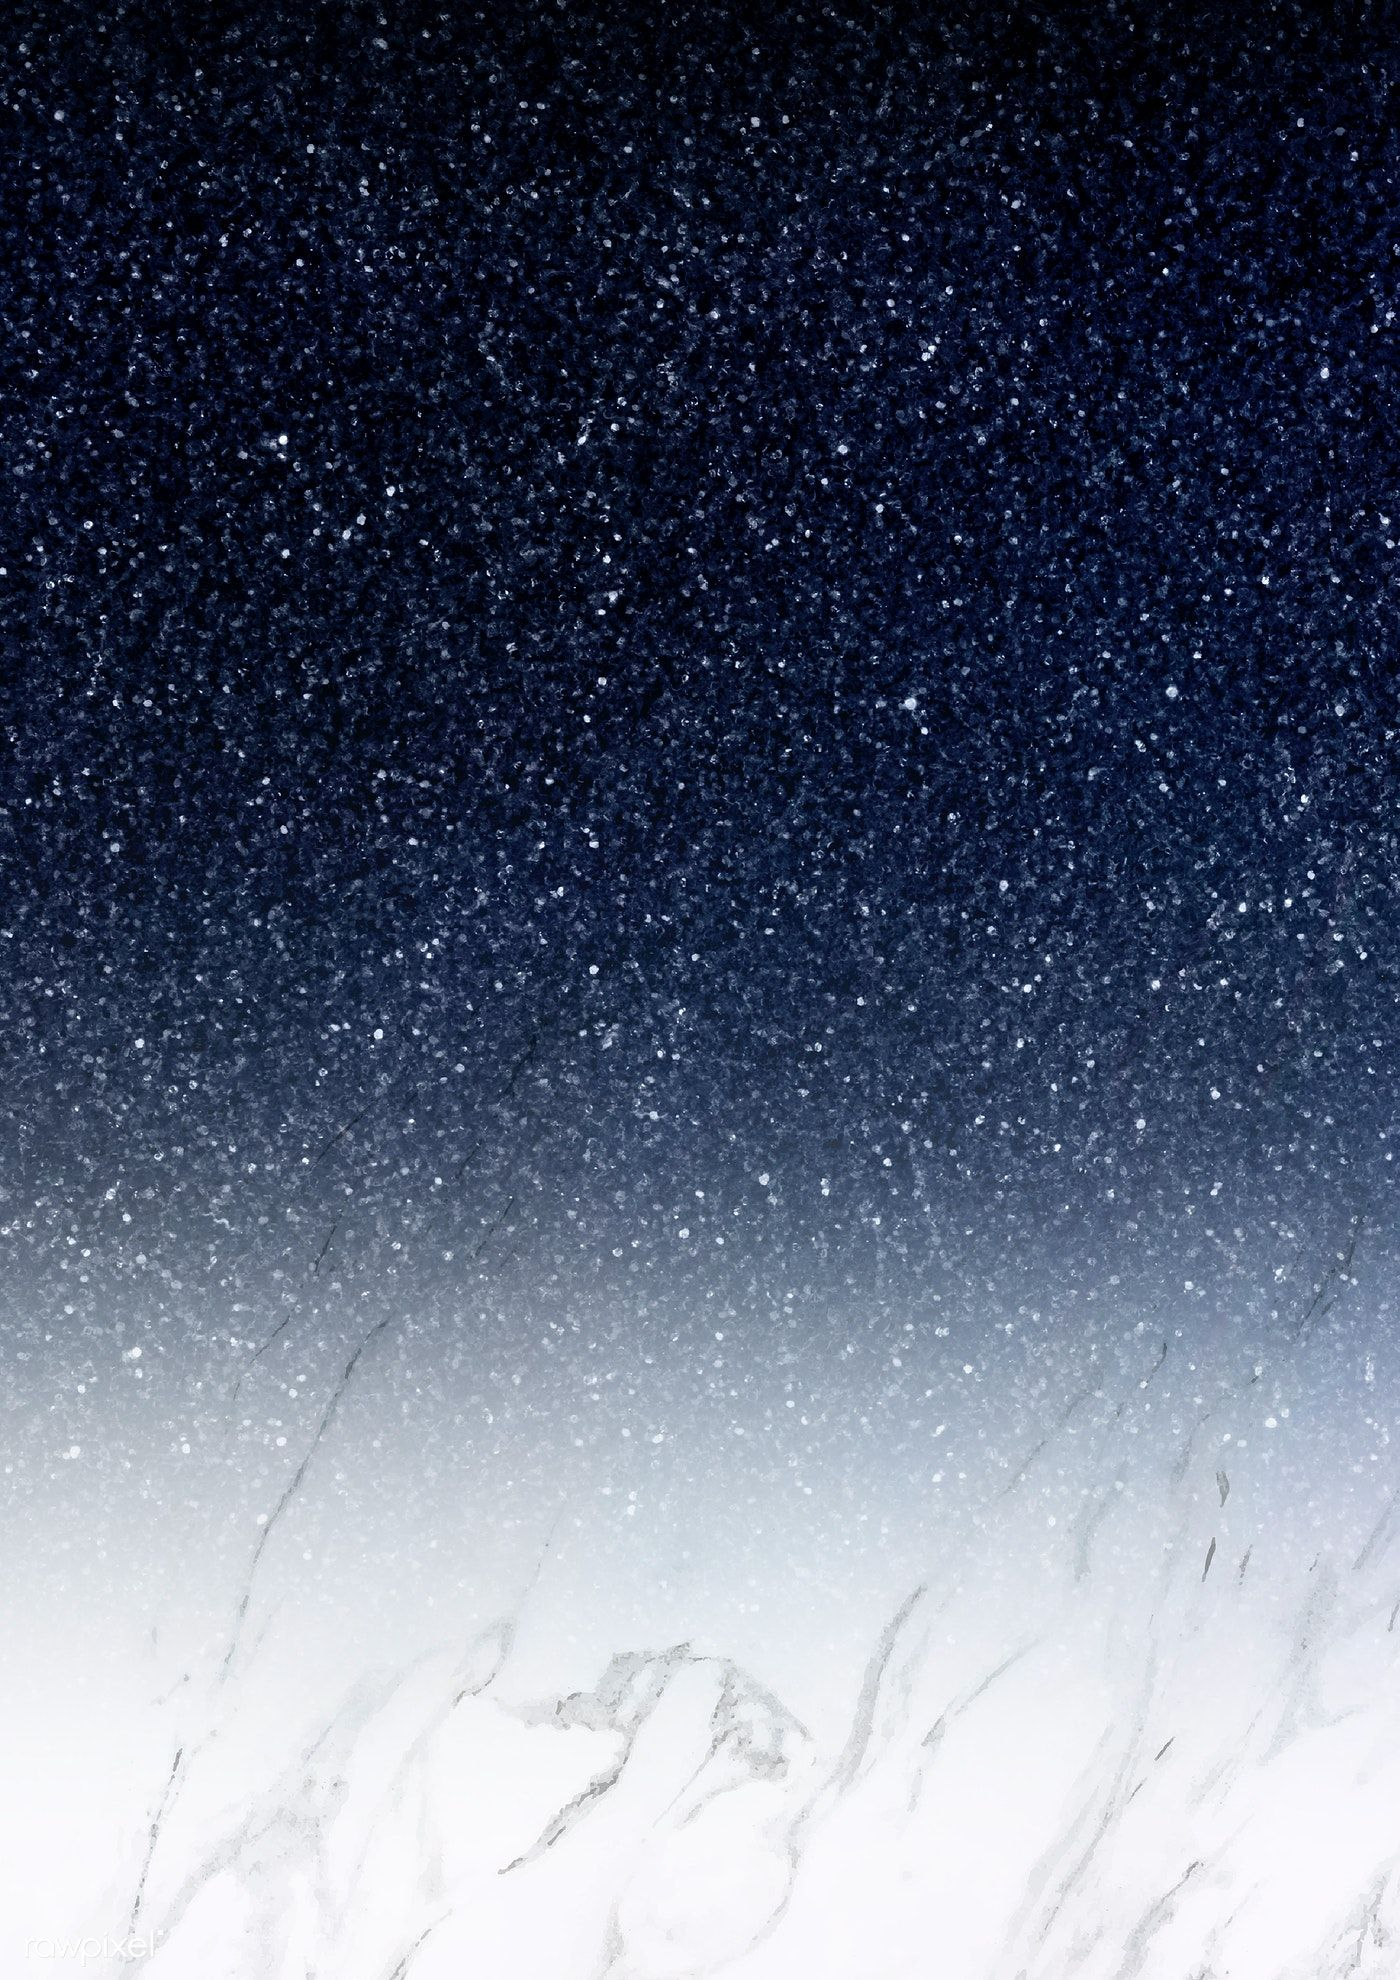 Download premium illustration of Dark blue ombre glitter